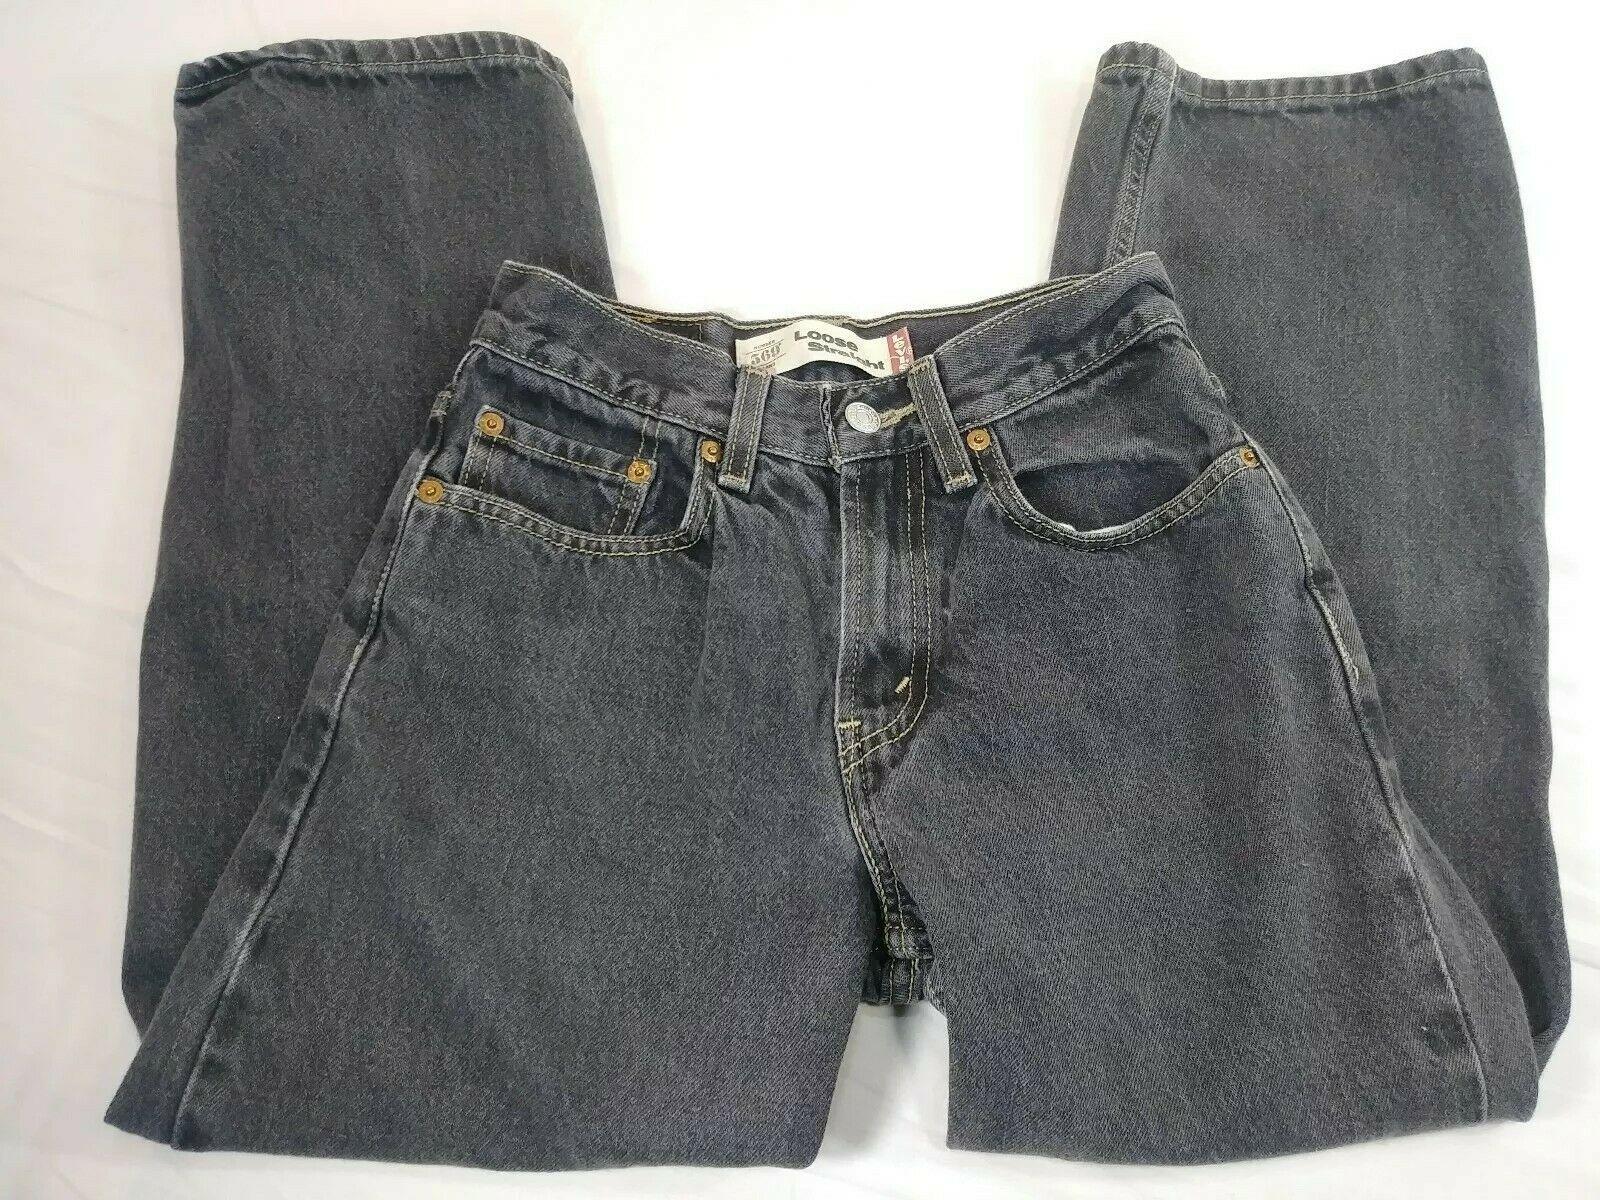 Boys Youth Levi's 569 Loose Straight Jeans Size 12 Black Denim (#7)